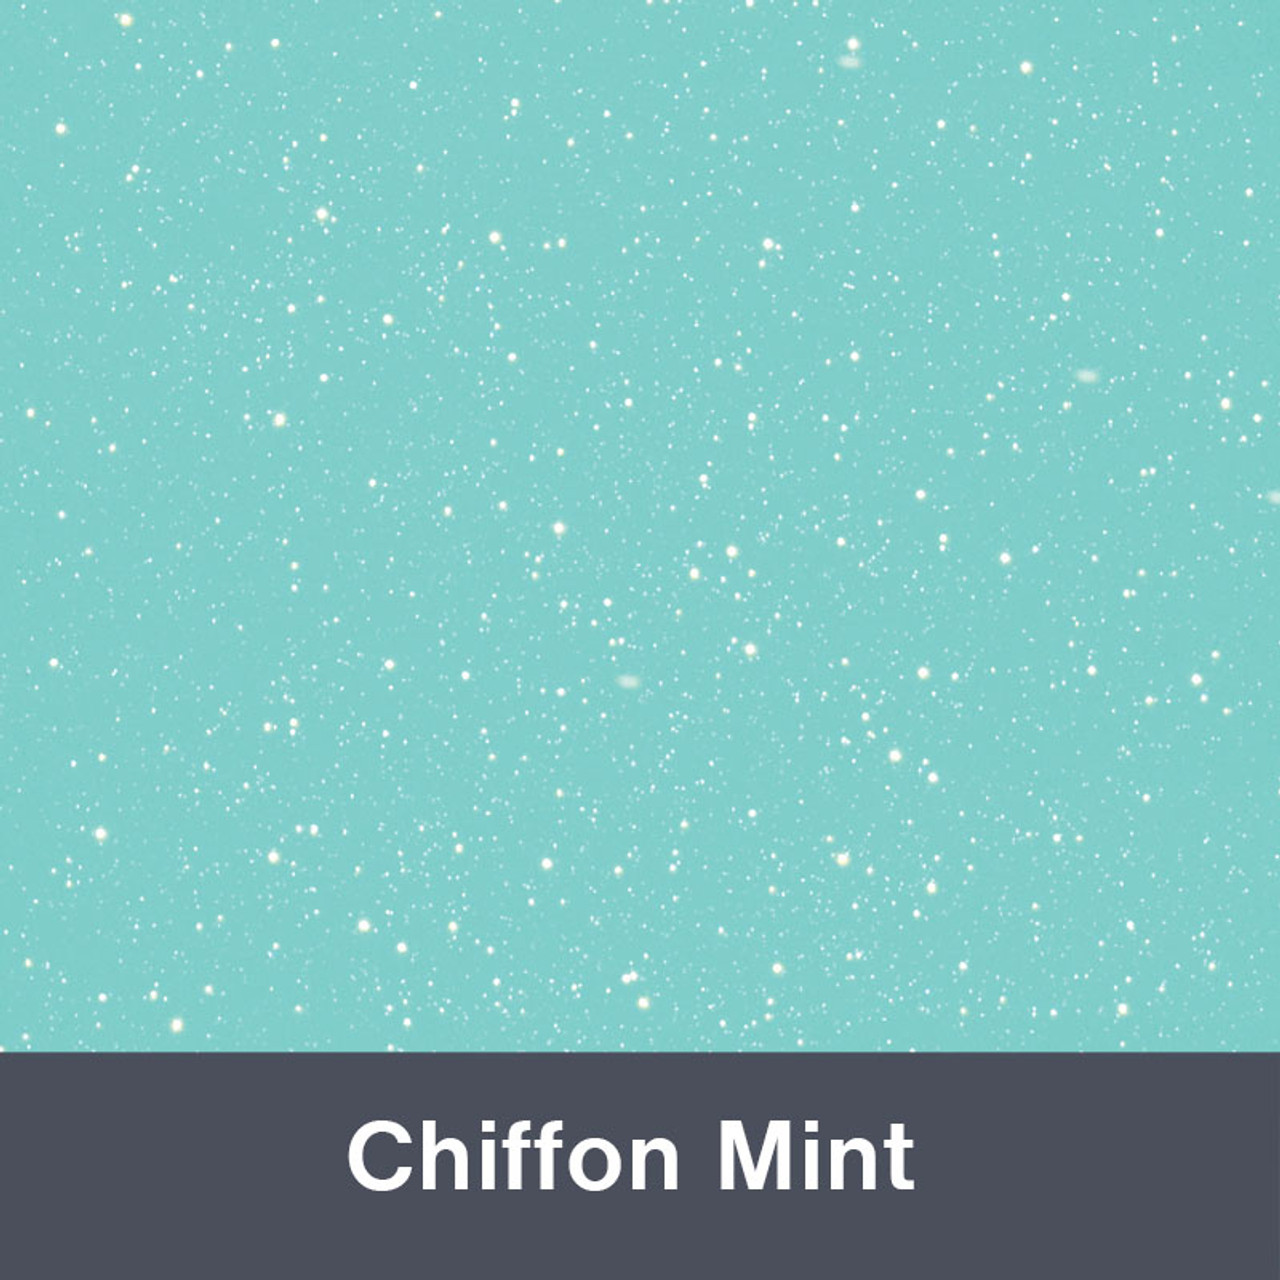 851 Chiffon Mint Sparkle